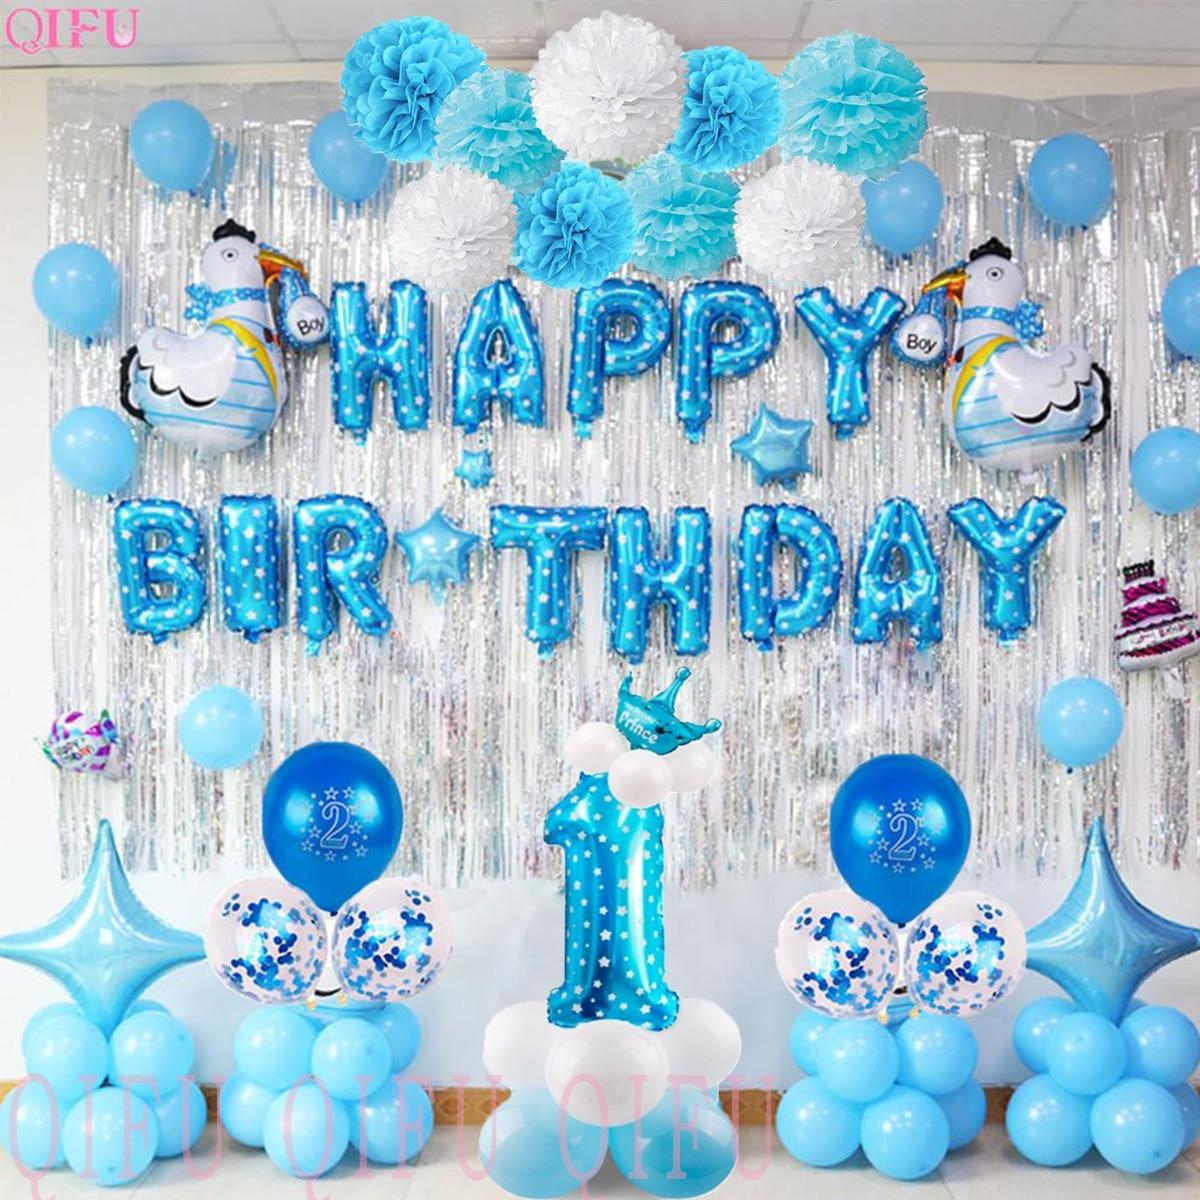 First Birthday Decor  QIFU 1 Birthday Boy 1st Birthday Party Decorations Kids My